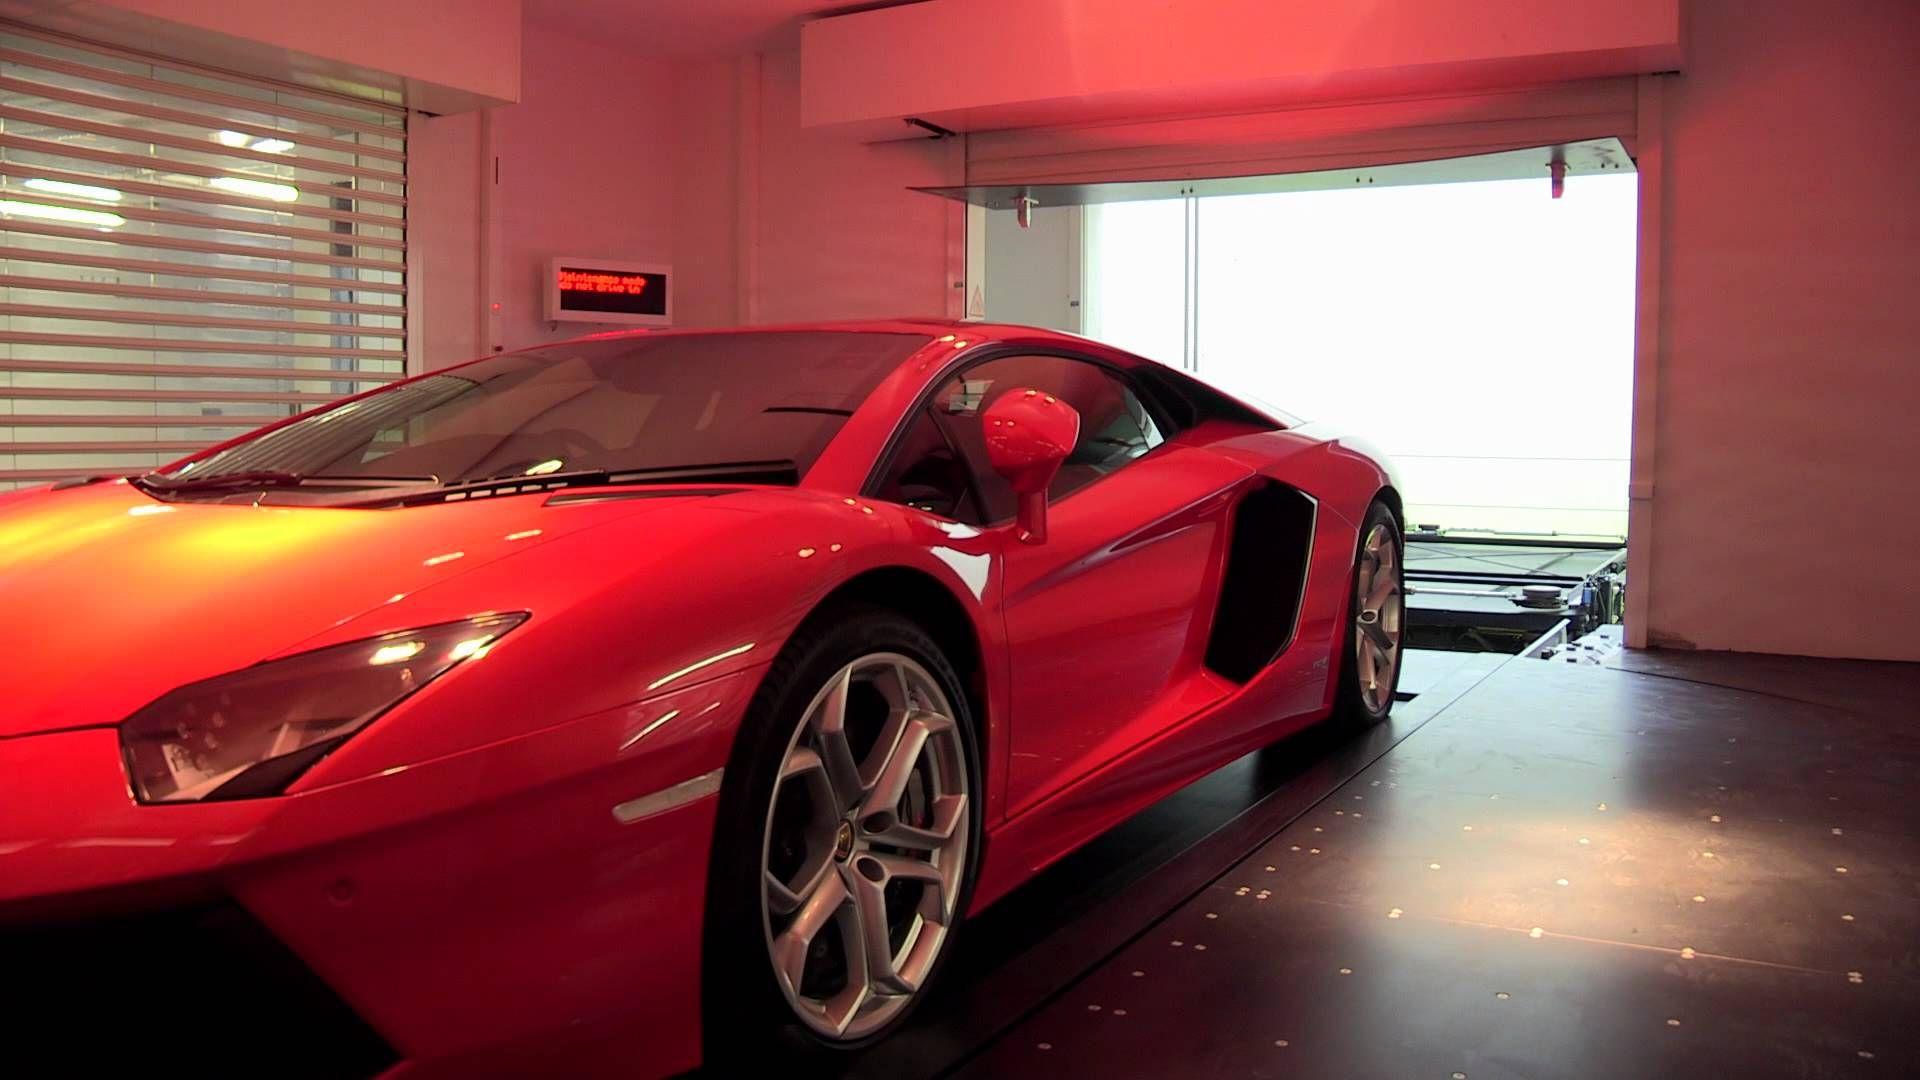 Millionaires Park Supercars In Their Living Room Super Cars Garage Design Interior Car